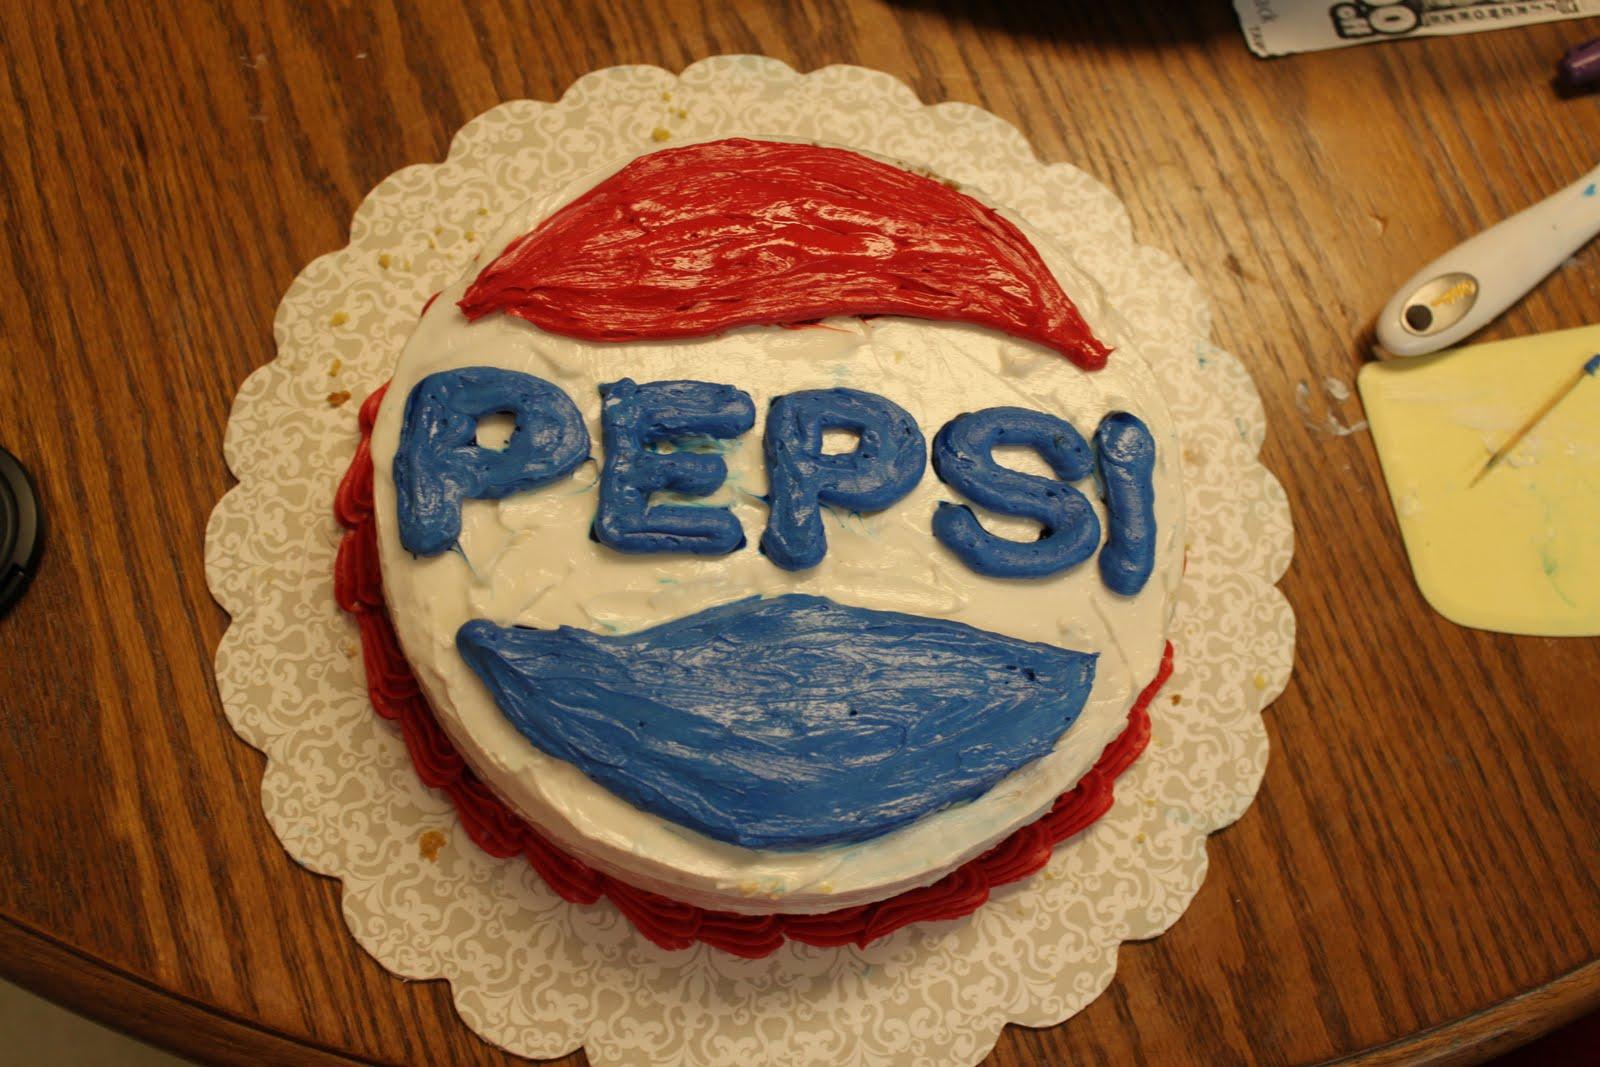 Vanessa S Cake Designs 8 One Layer Pepsi Cake